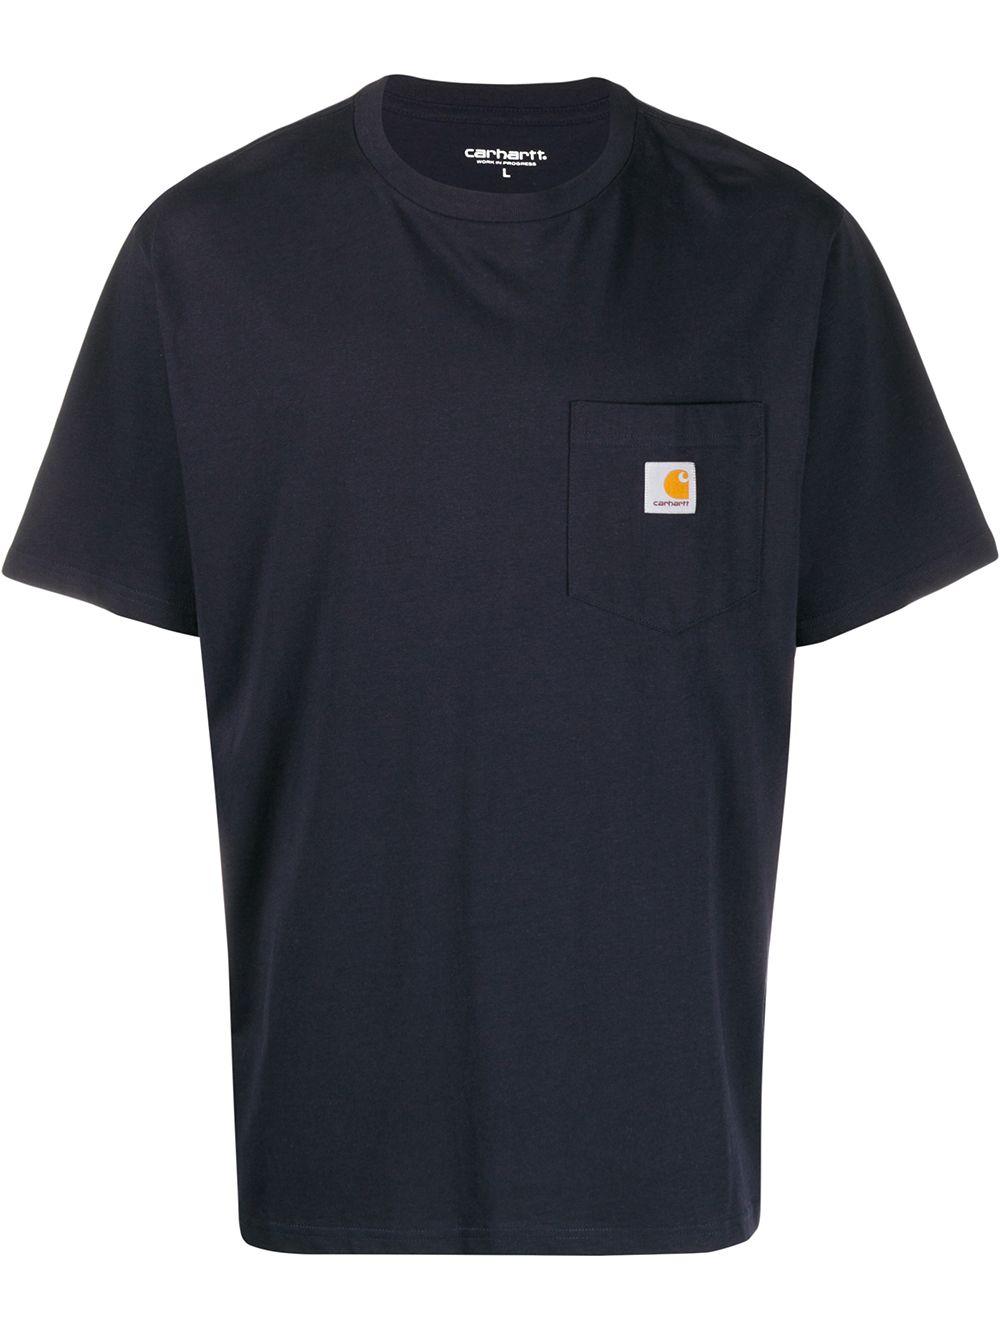 pocket t-shirt uomo blue in cotton CARHARTT WIP | T-shirts | I0220911C.XX